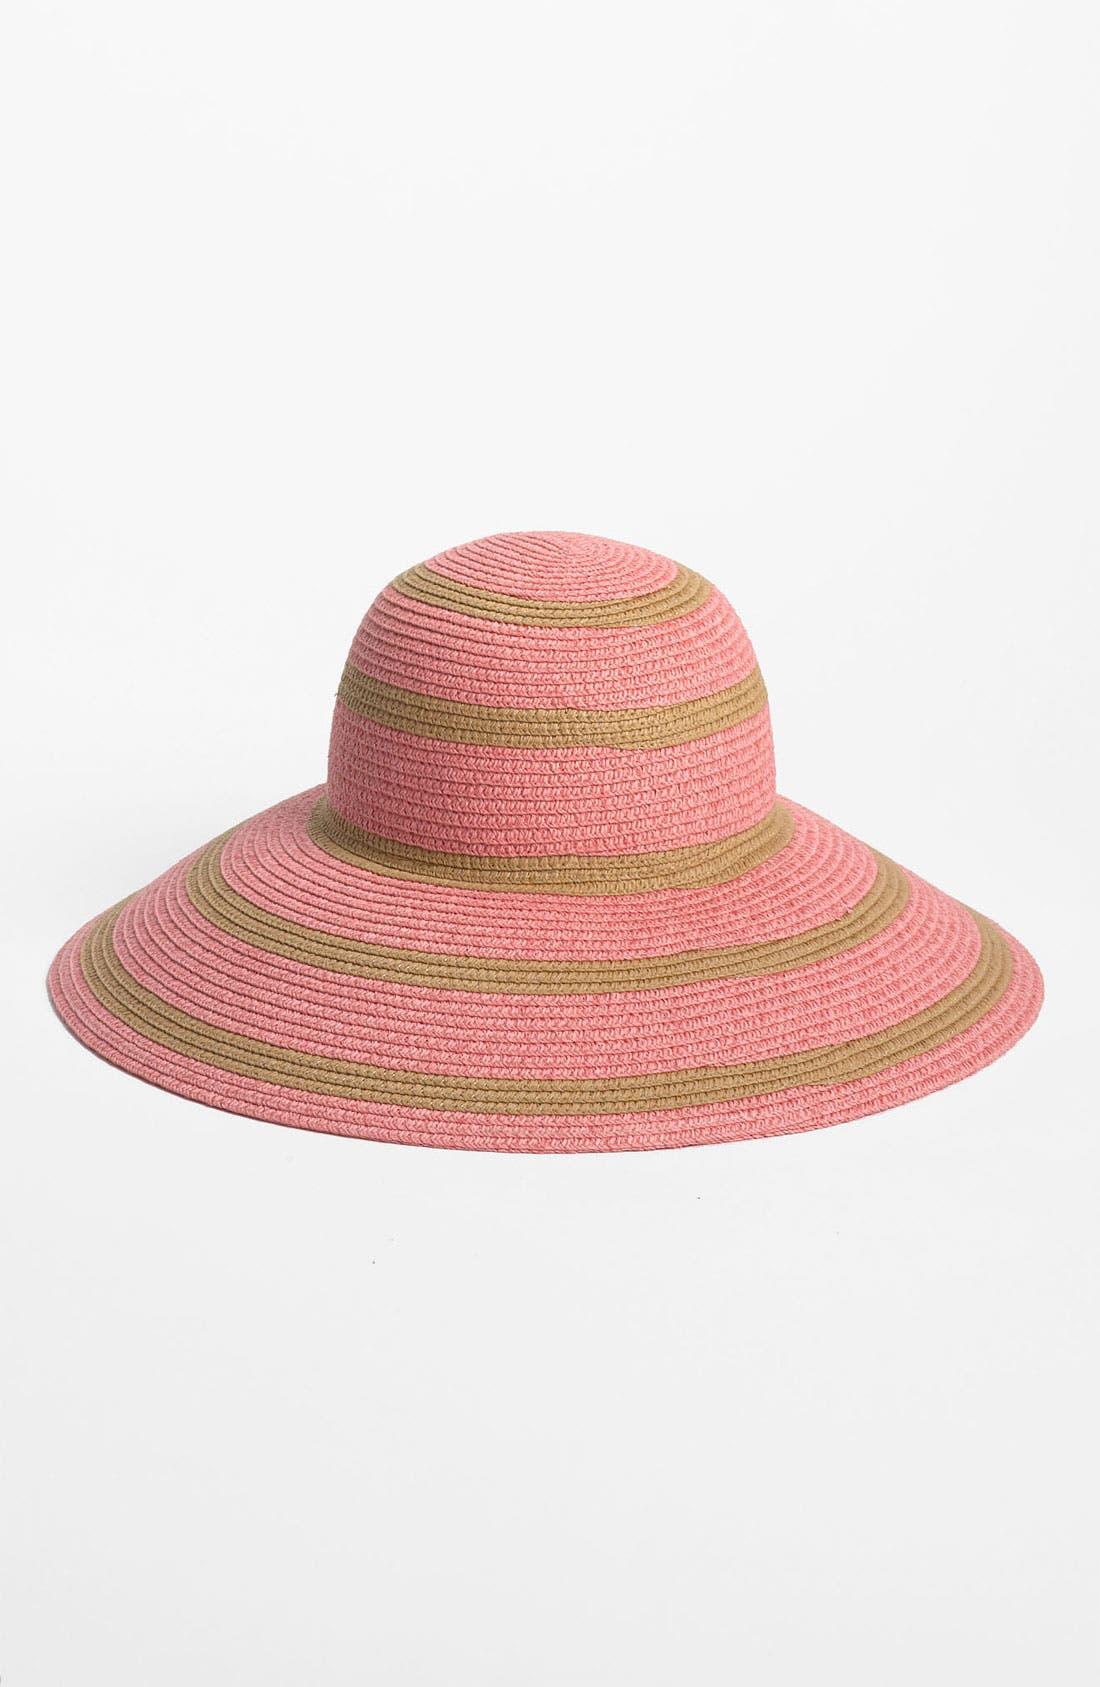 Alternate Image 1 Selected - Nordstrom 'Medium Stripe' Floppy Straw Hat